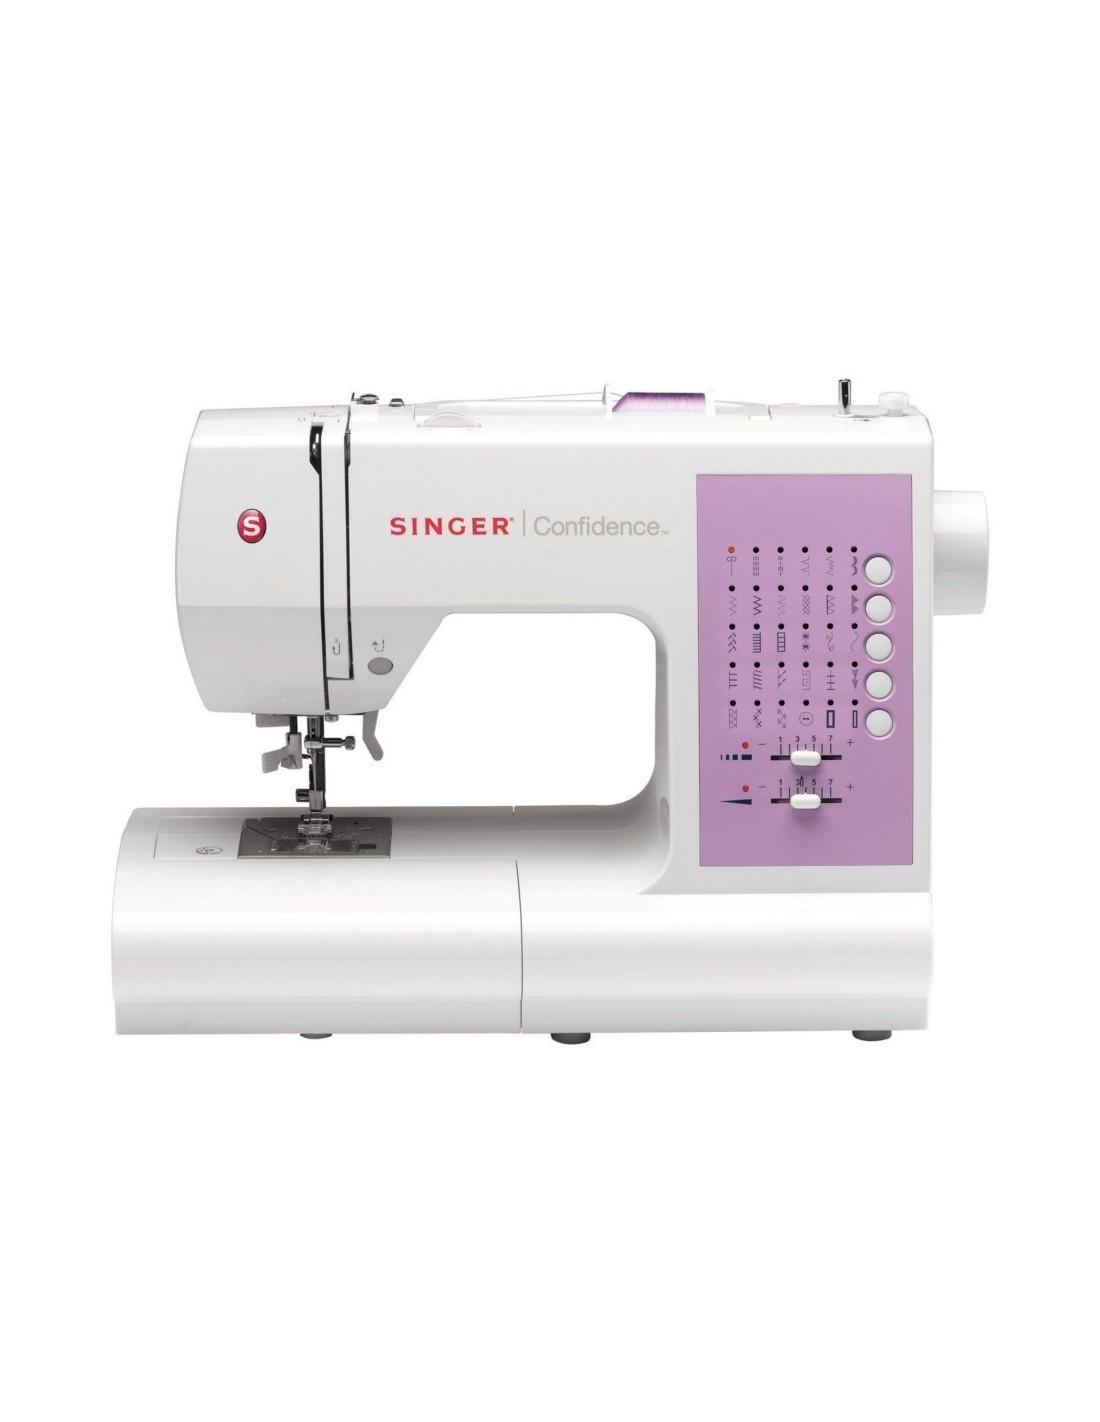 Macchina da cucire singer confidence 7463 macchine per for Ipercoop macchina da cucire